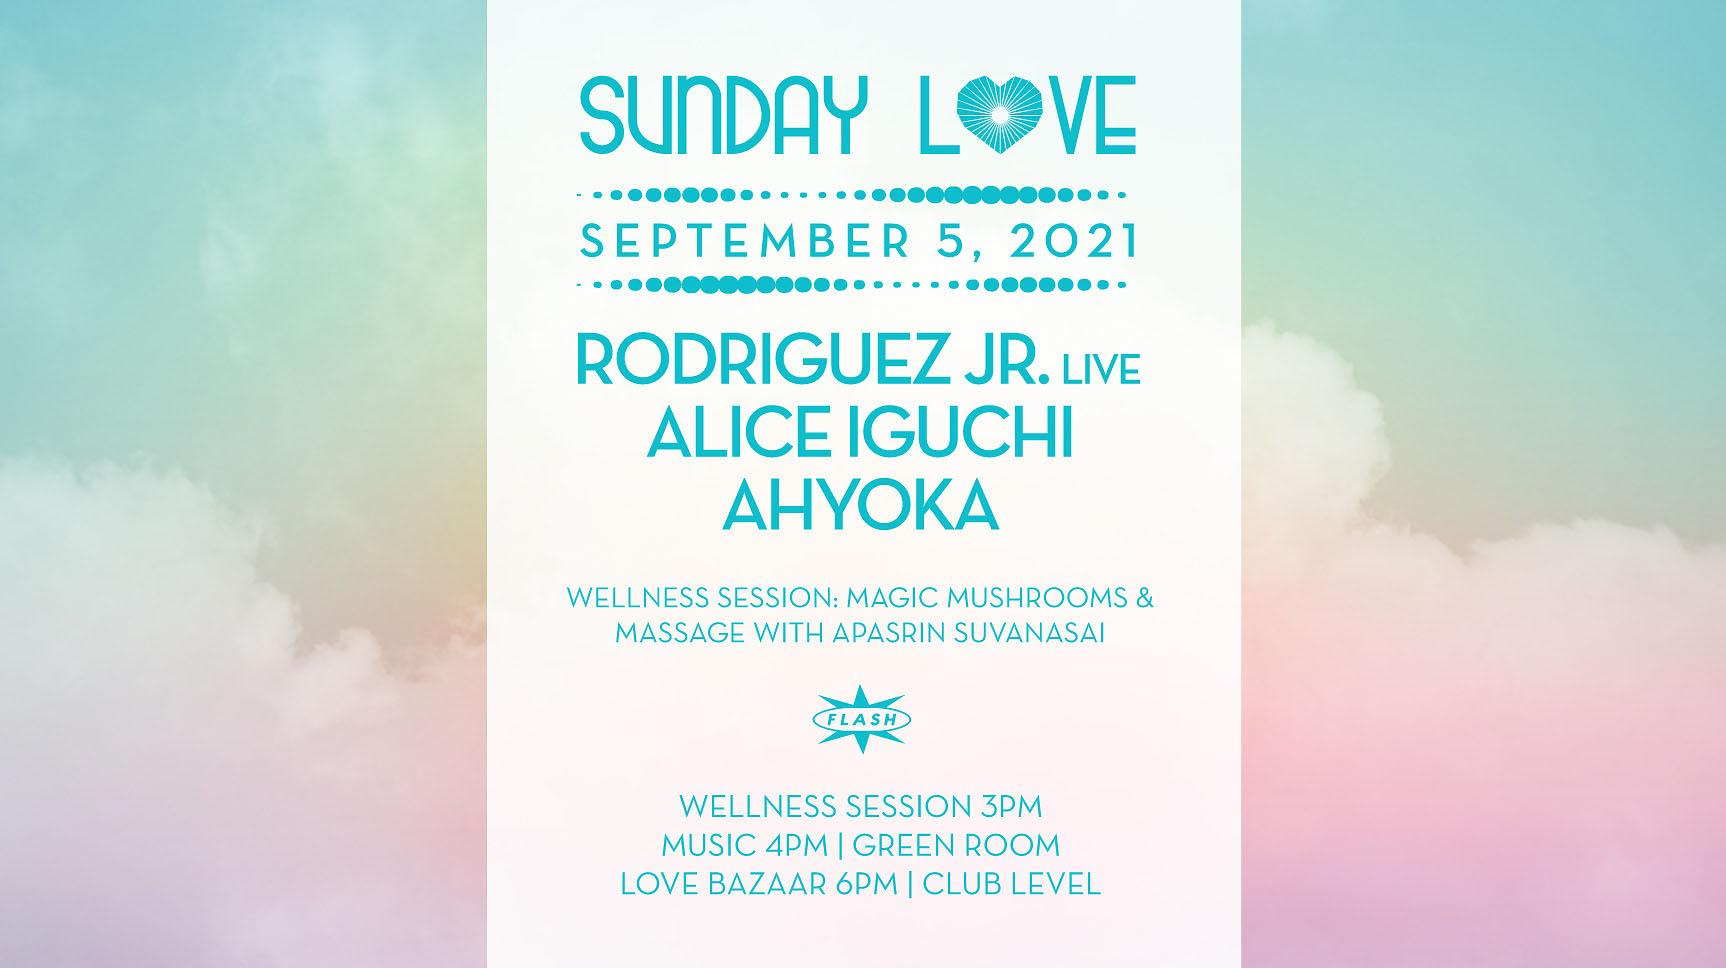 Sunday Love: Rodriguez Jr [LIVE] - Alice Iguchi - AYHOKA